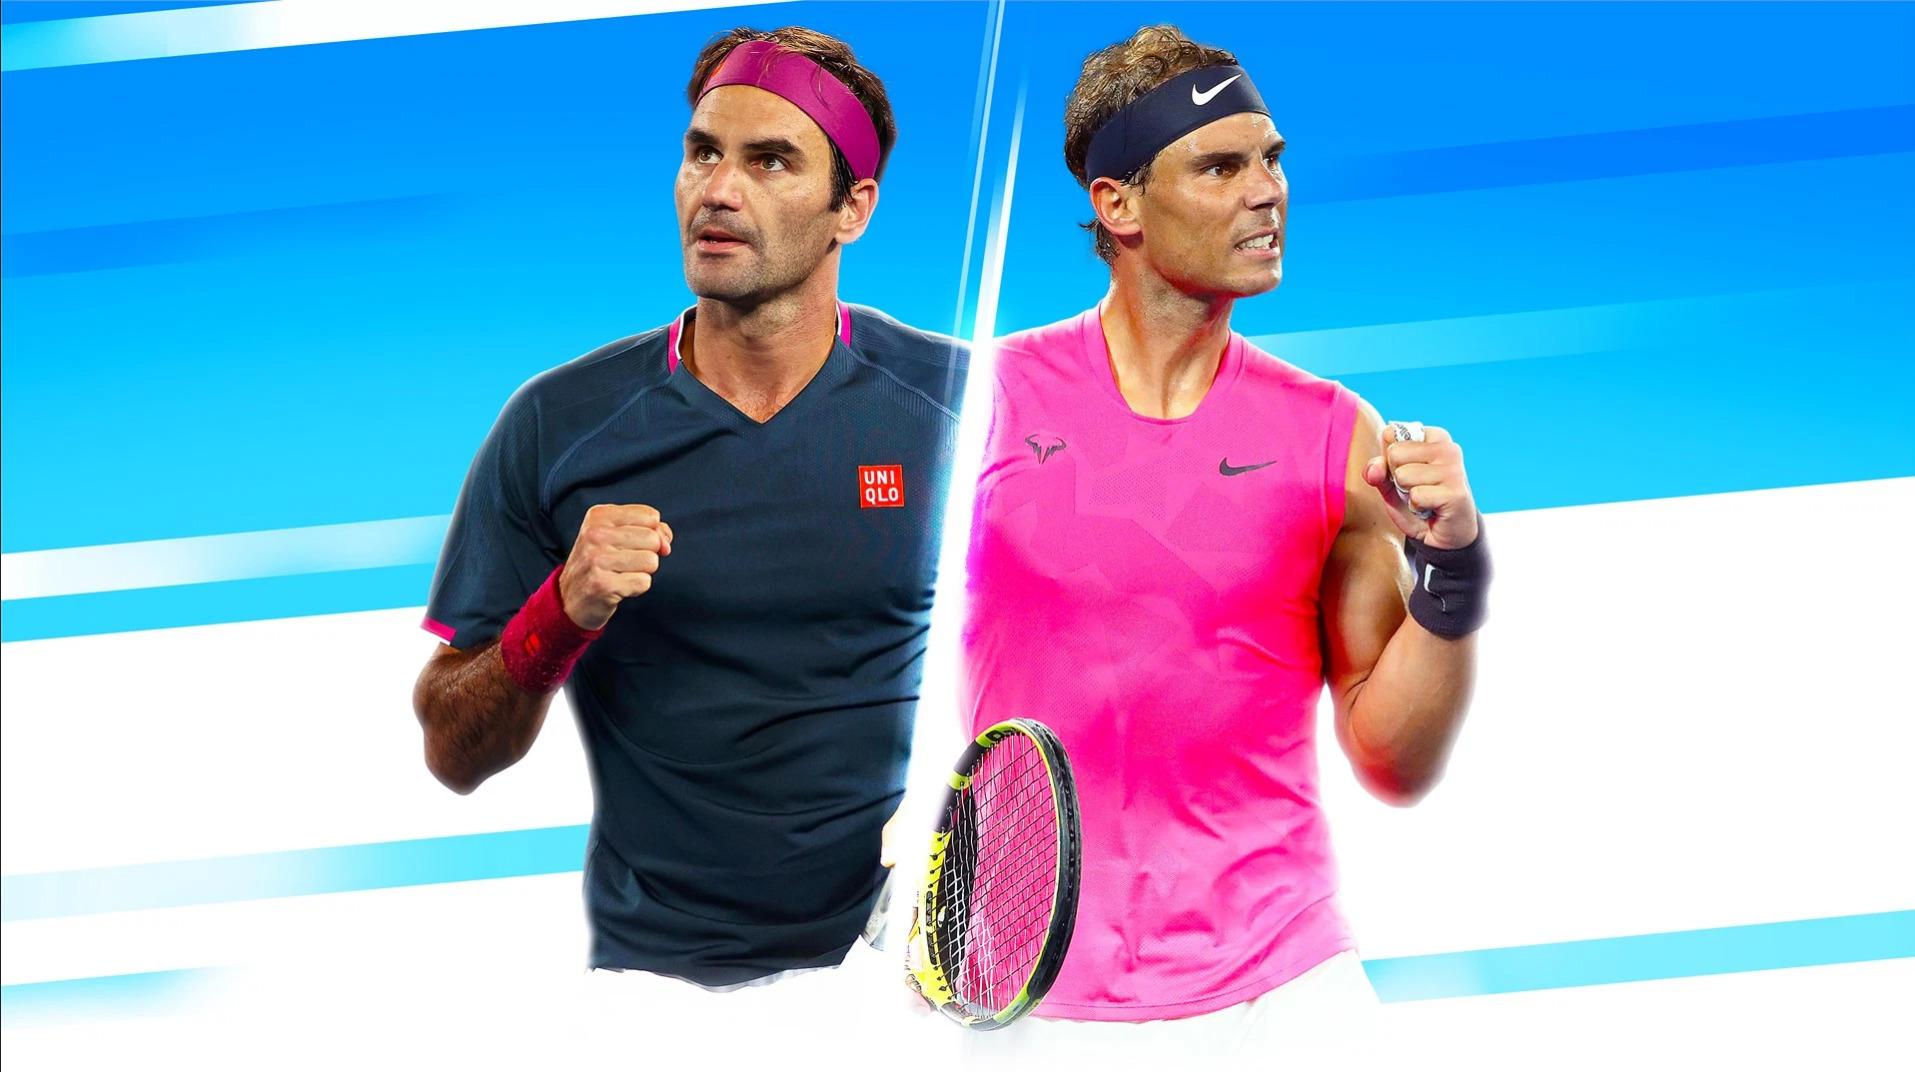 Tennis World Tour 2 (Playstation 4) | Análise Gaming | CA Notícias